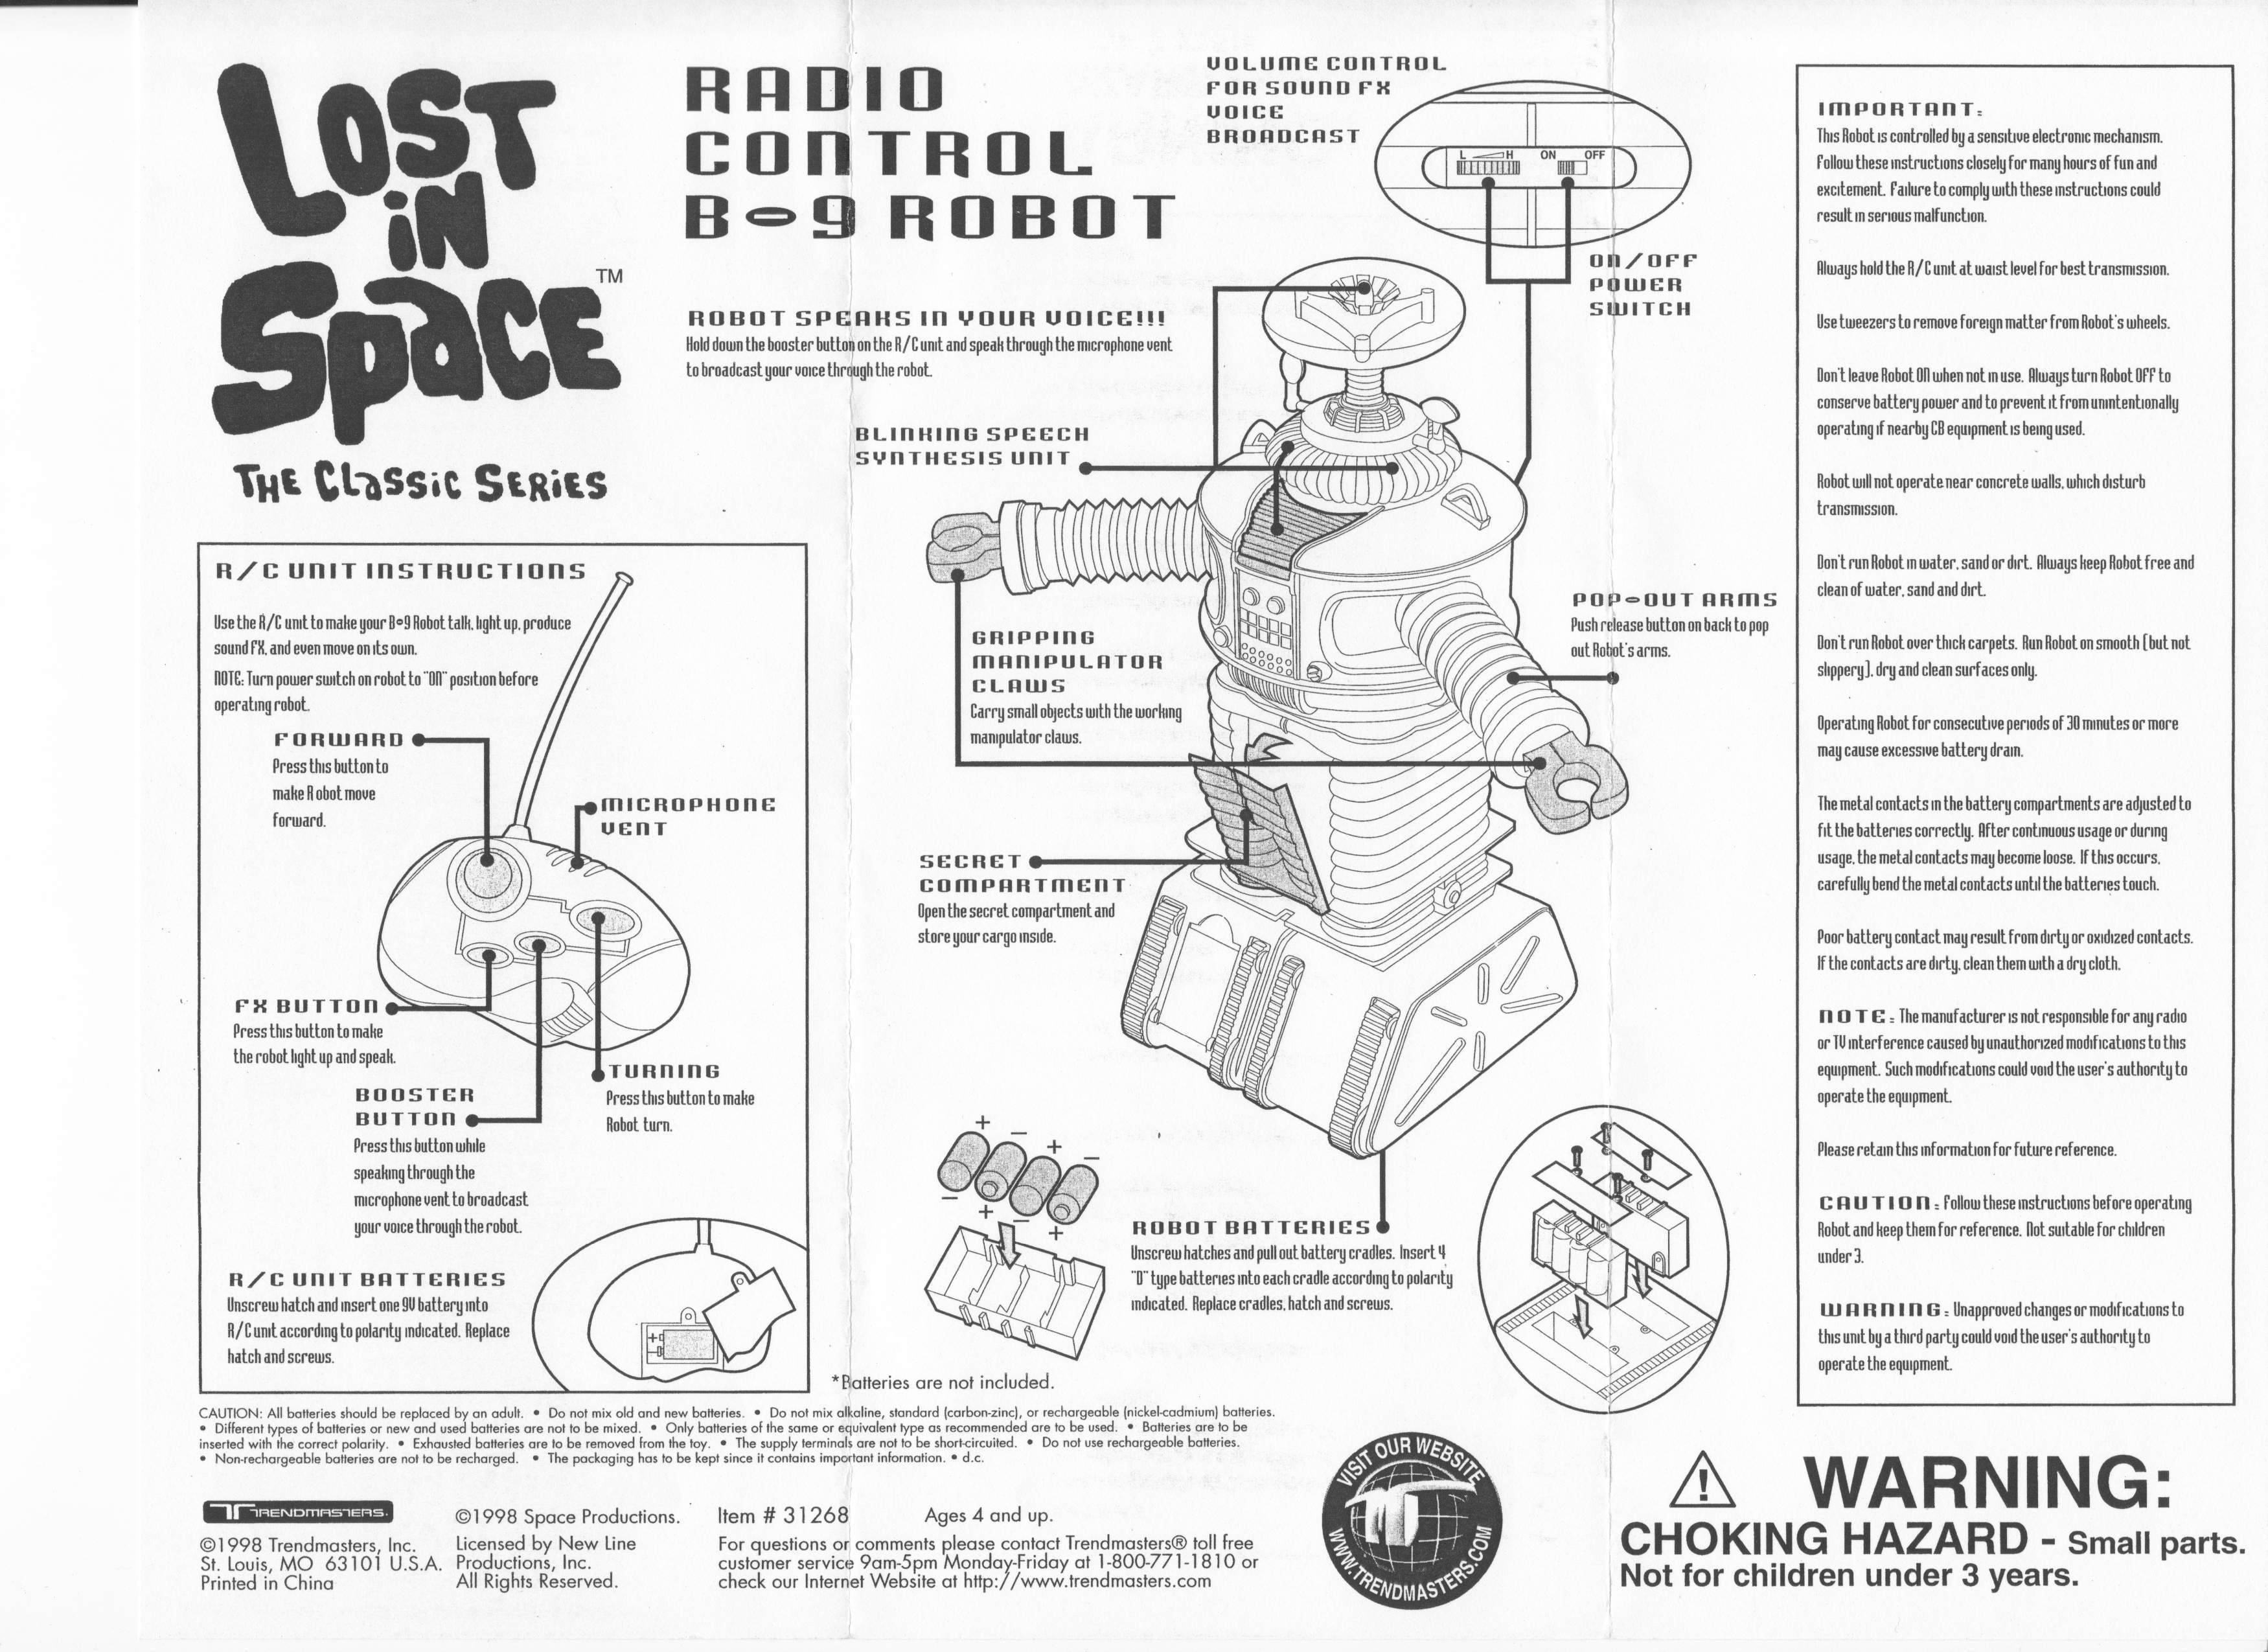 Robot Division